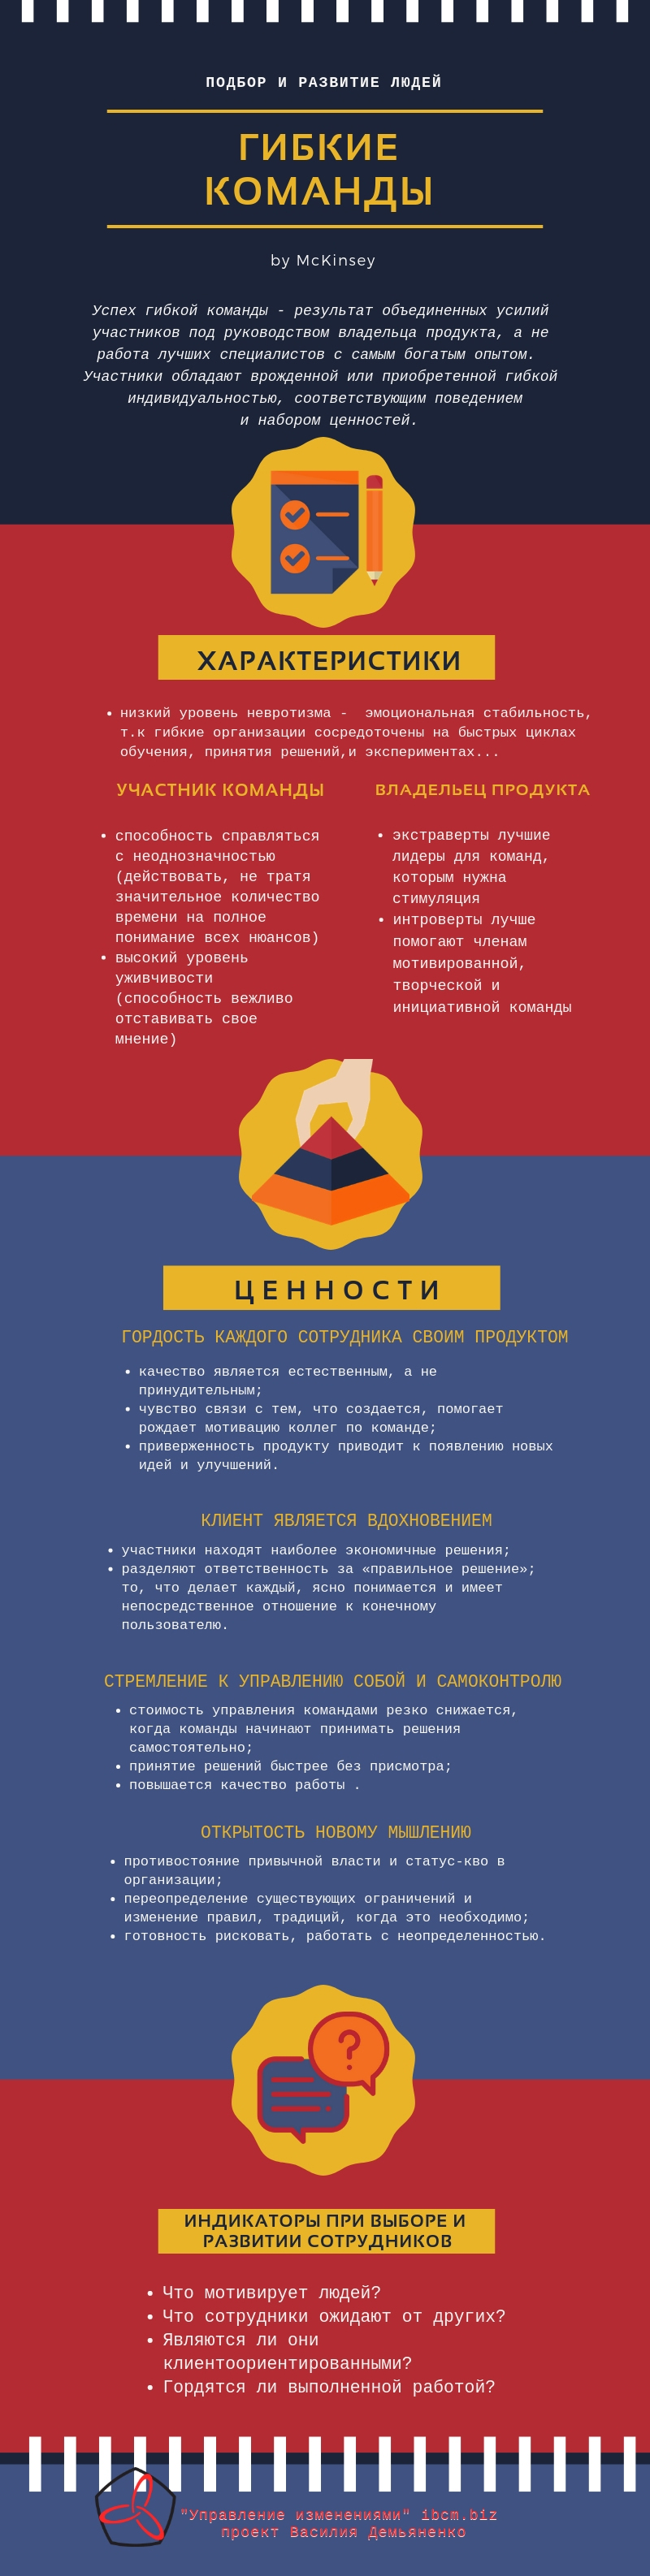 Подбор и развитие участников гибких команд.